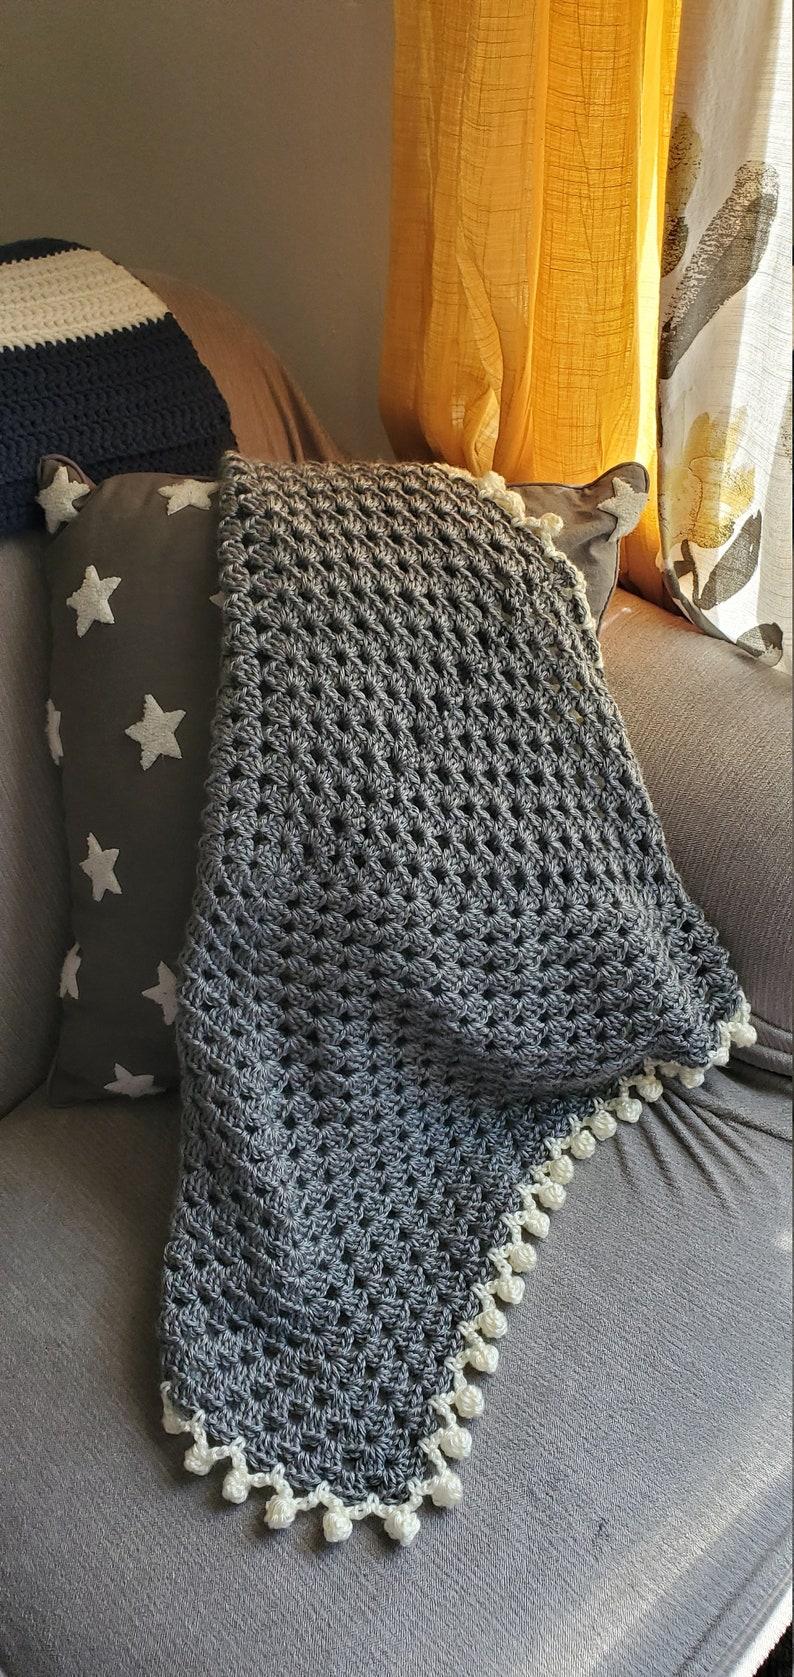 Granny Square Baby Blanket  Grey/Cream image 1